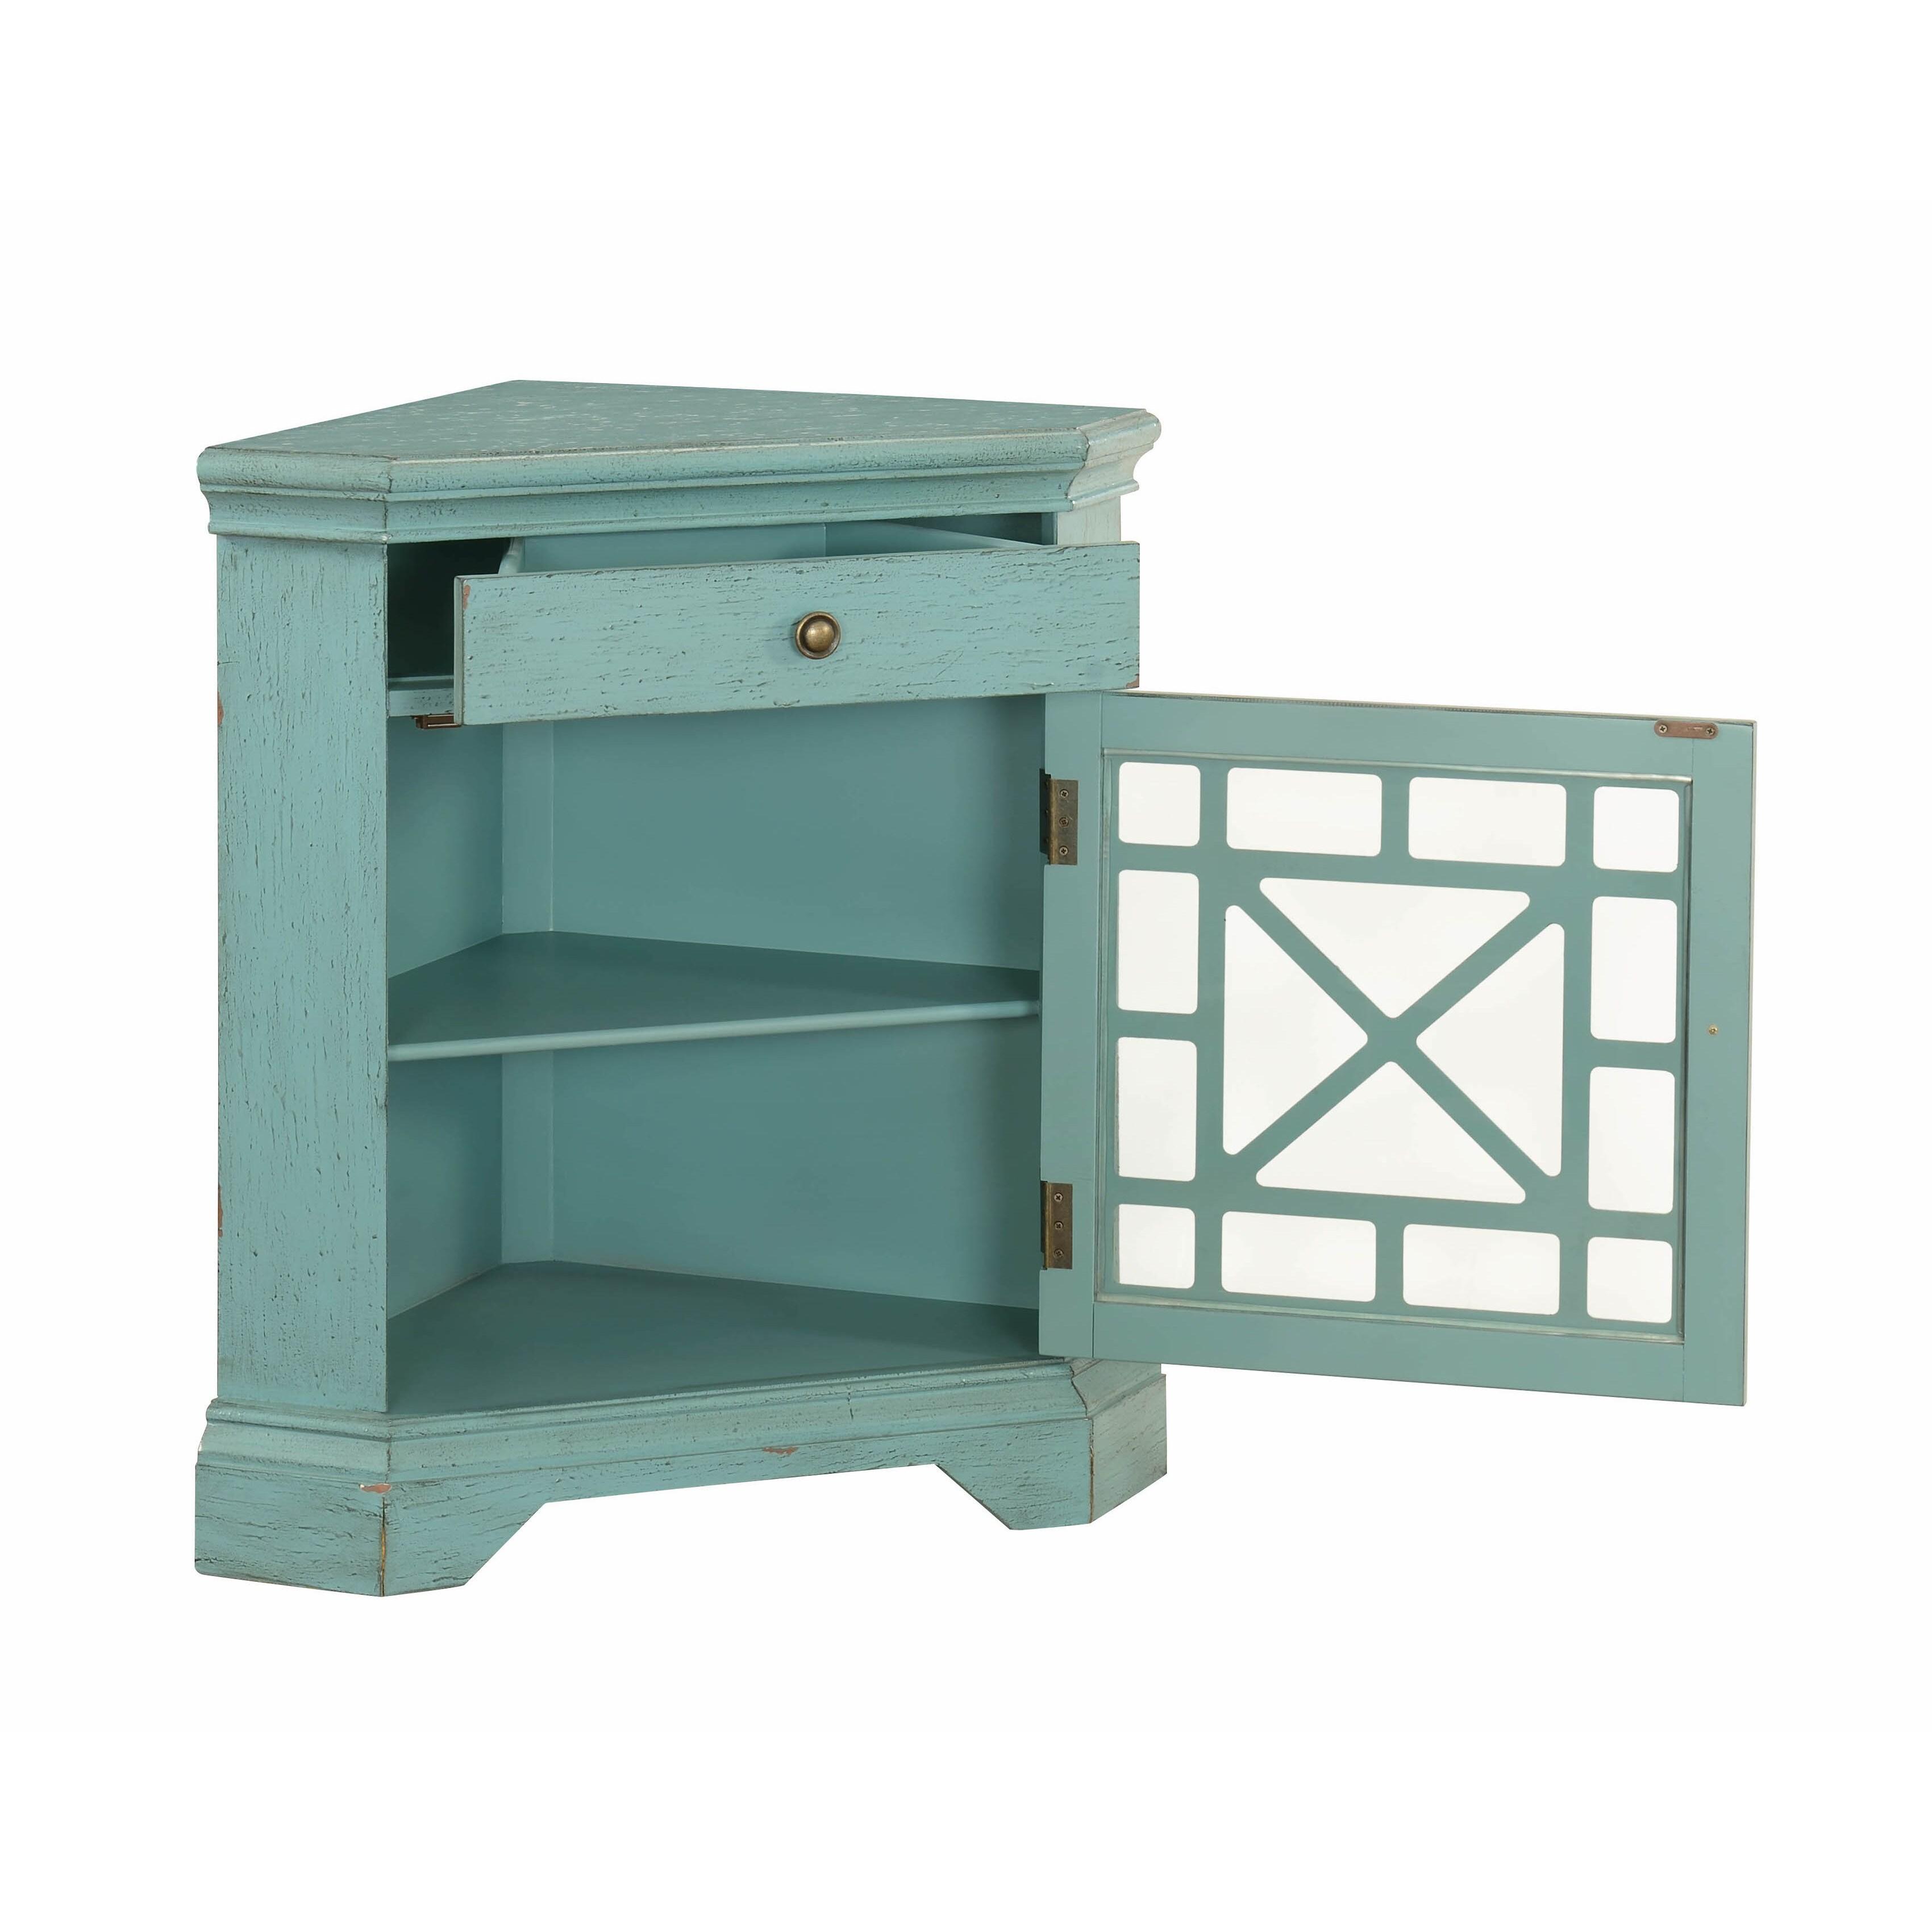 Shop Somette 1-Door Textured Bayberry Blue Corner Cabinet - Free ...